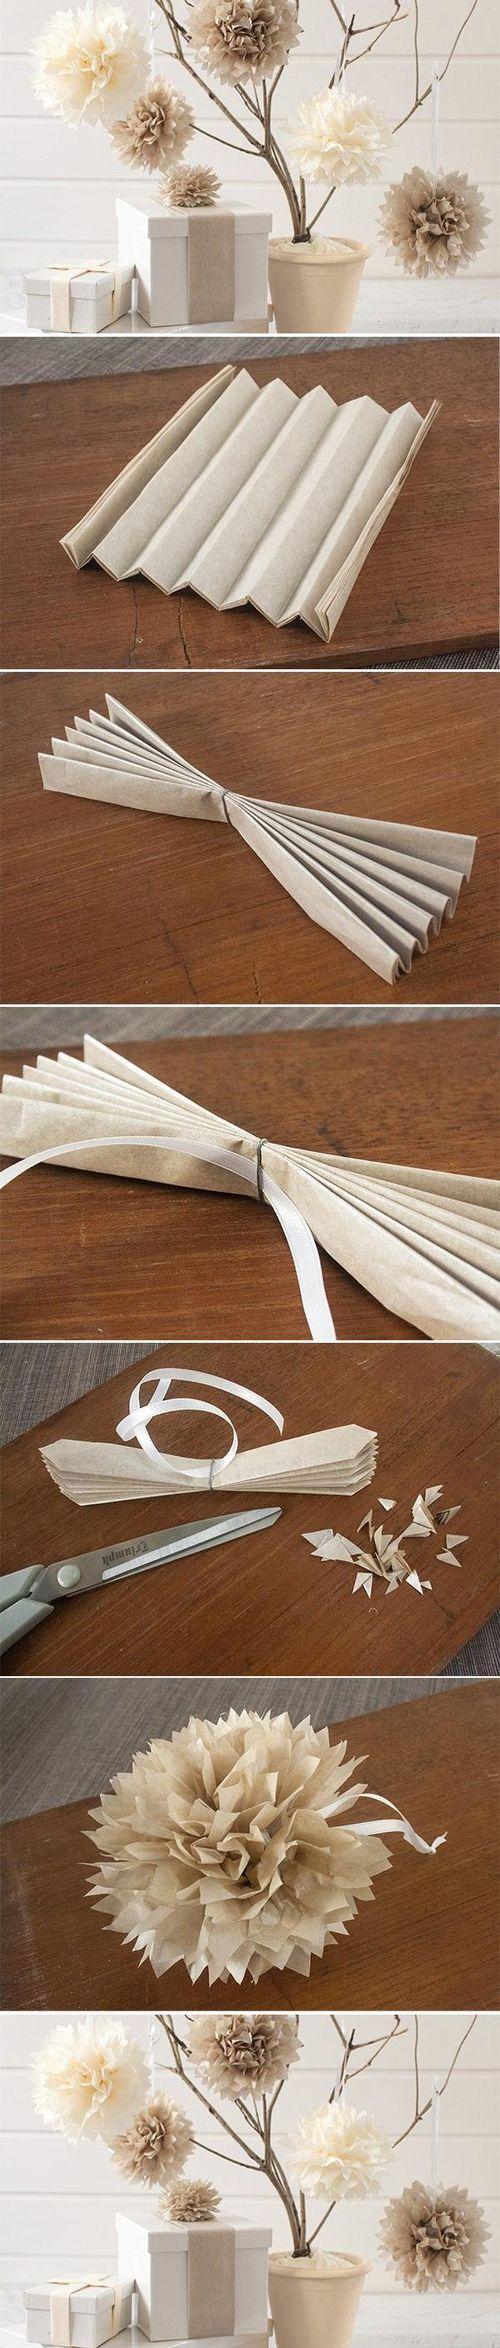 DIY Beautiful Paper Flower Ball DIY Projects / UsefulDIY.com